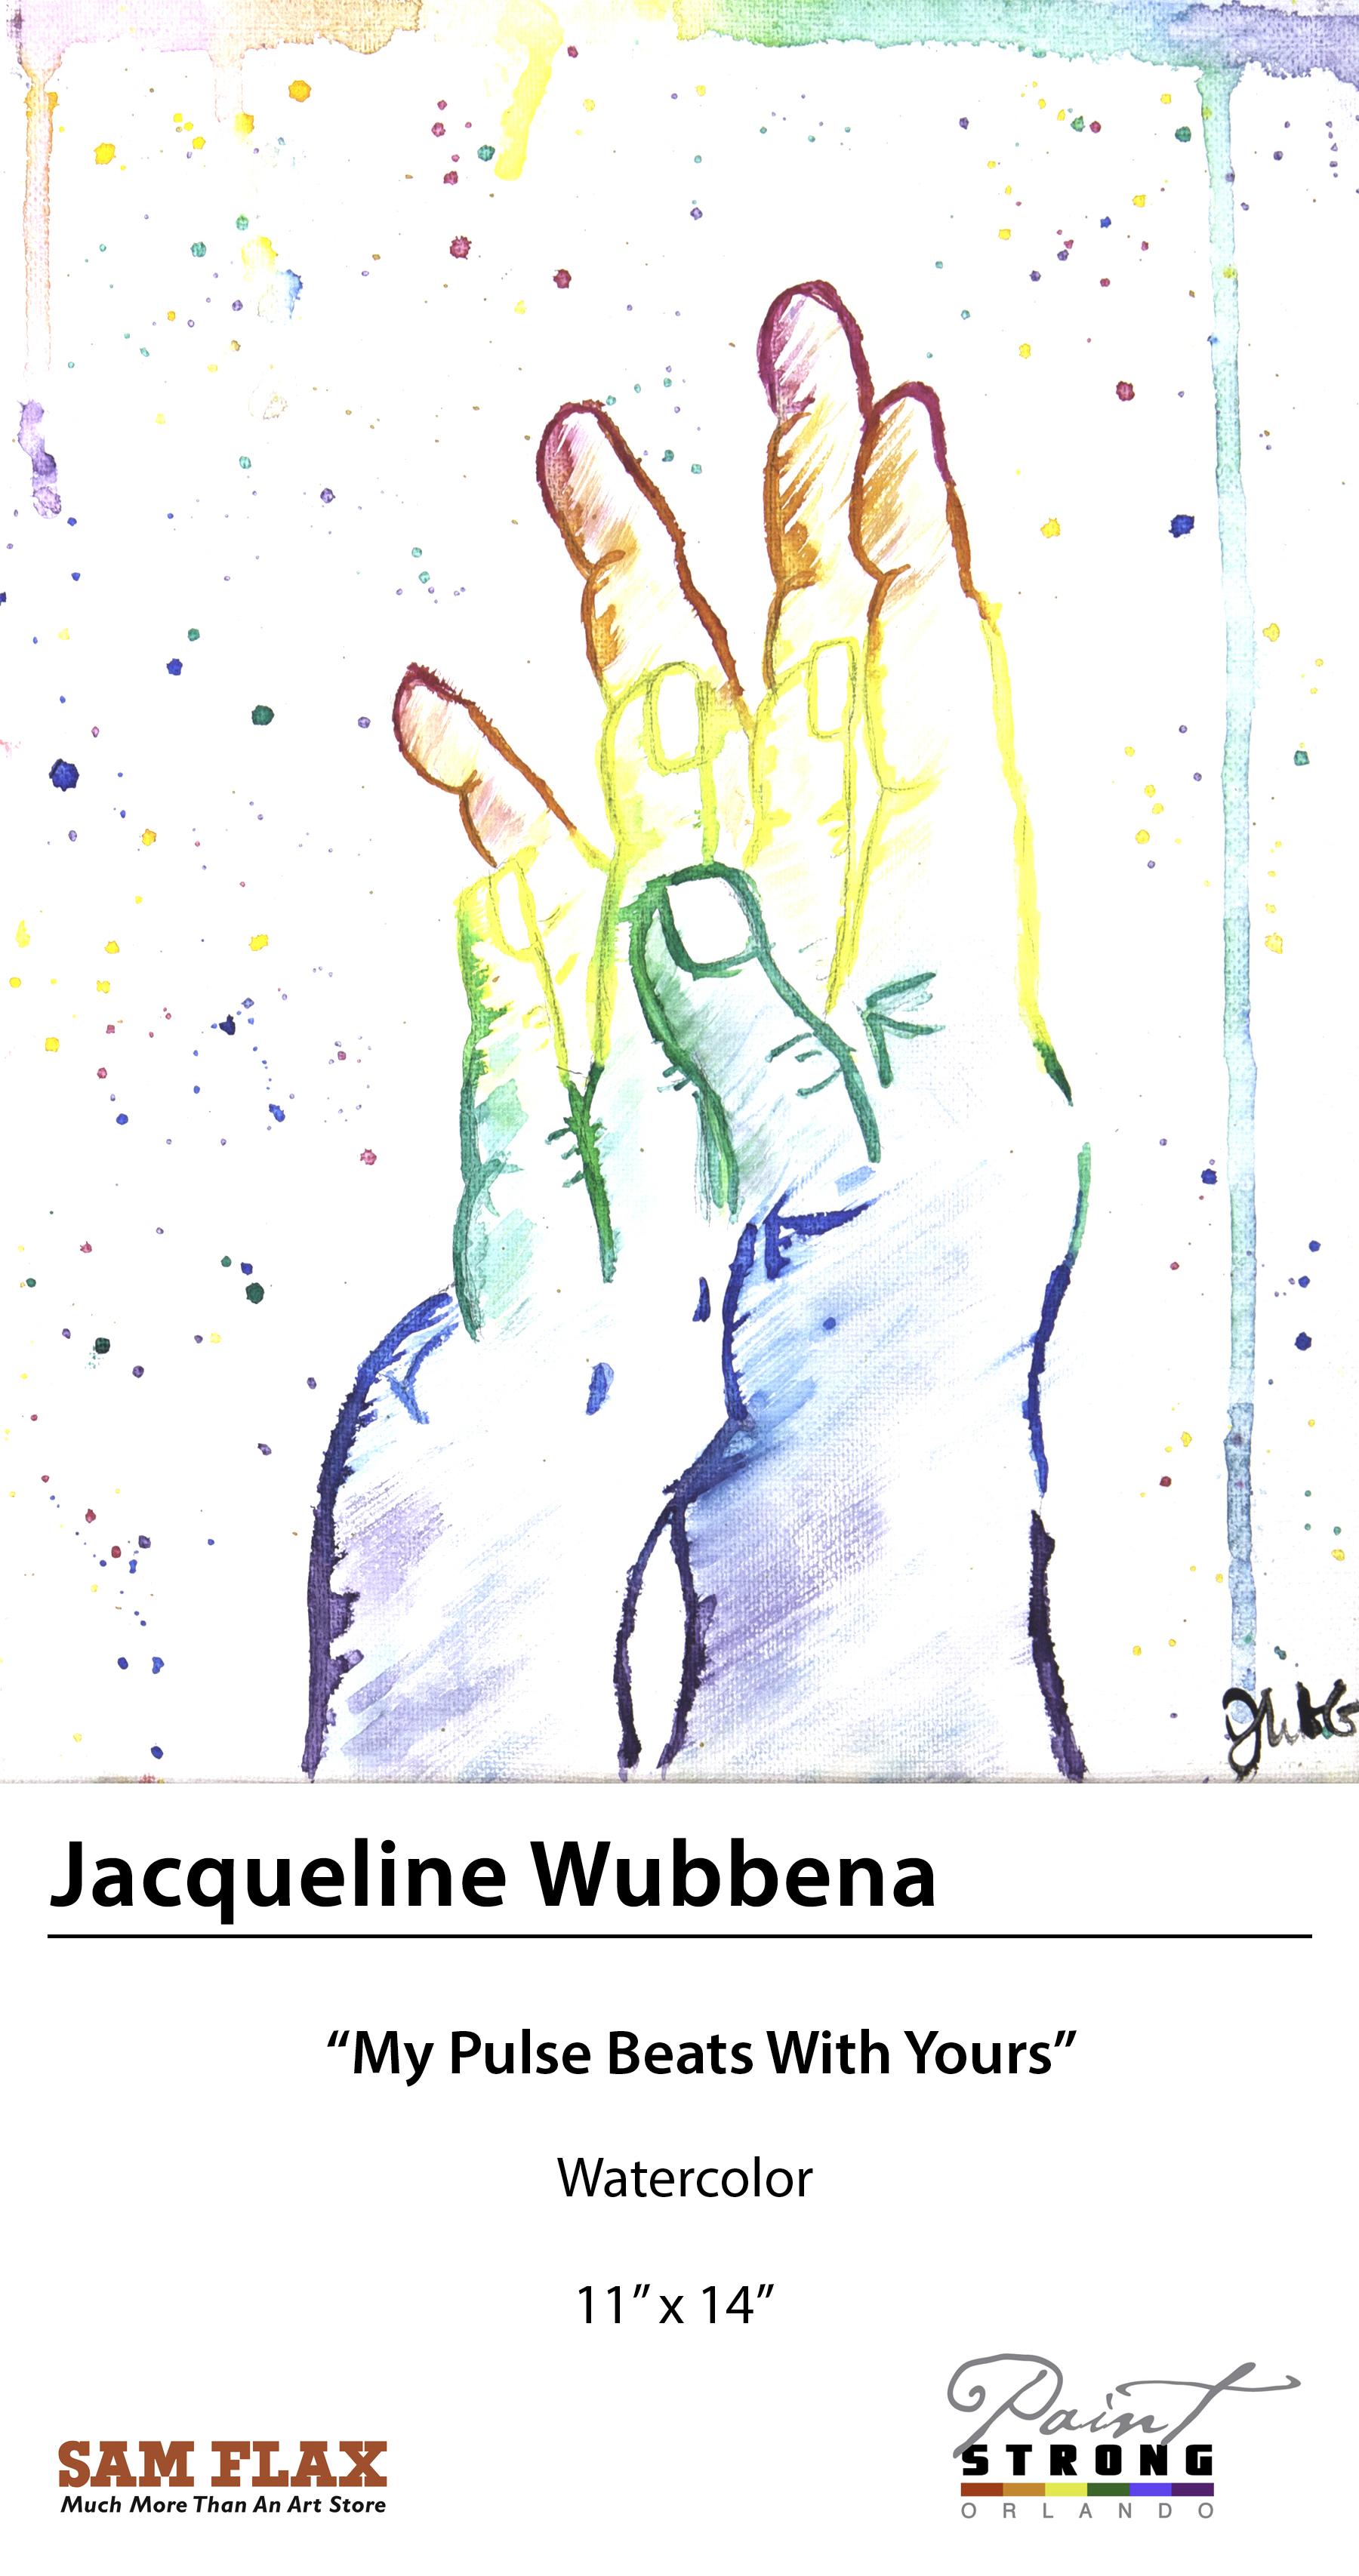 Jacqueline Wubbena